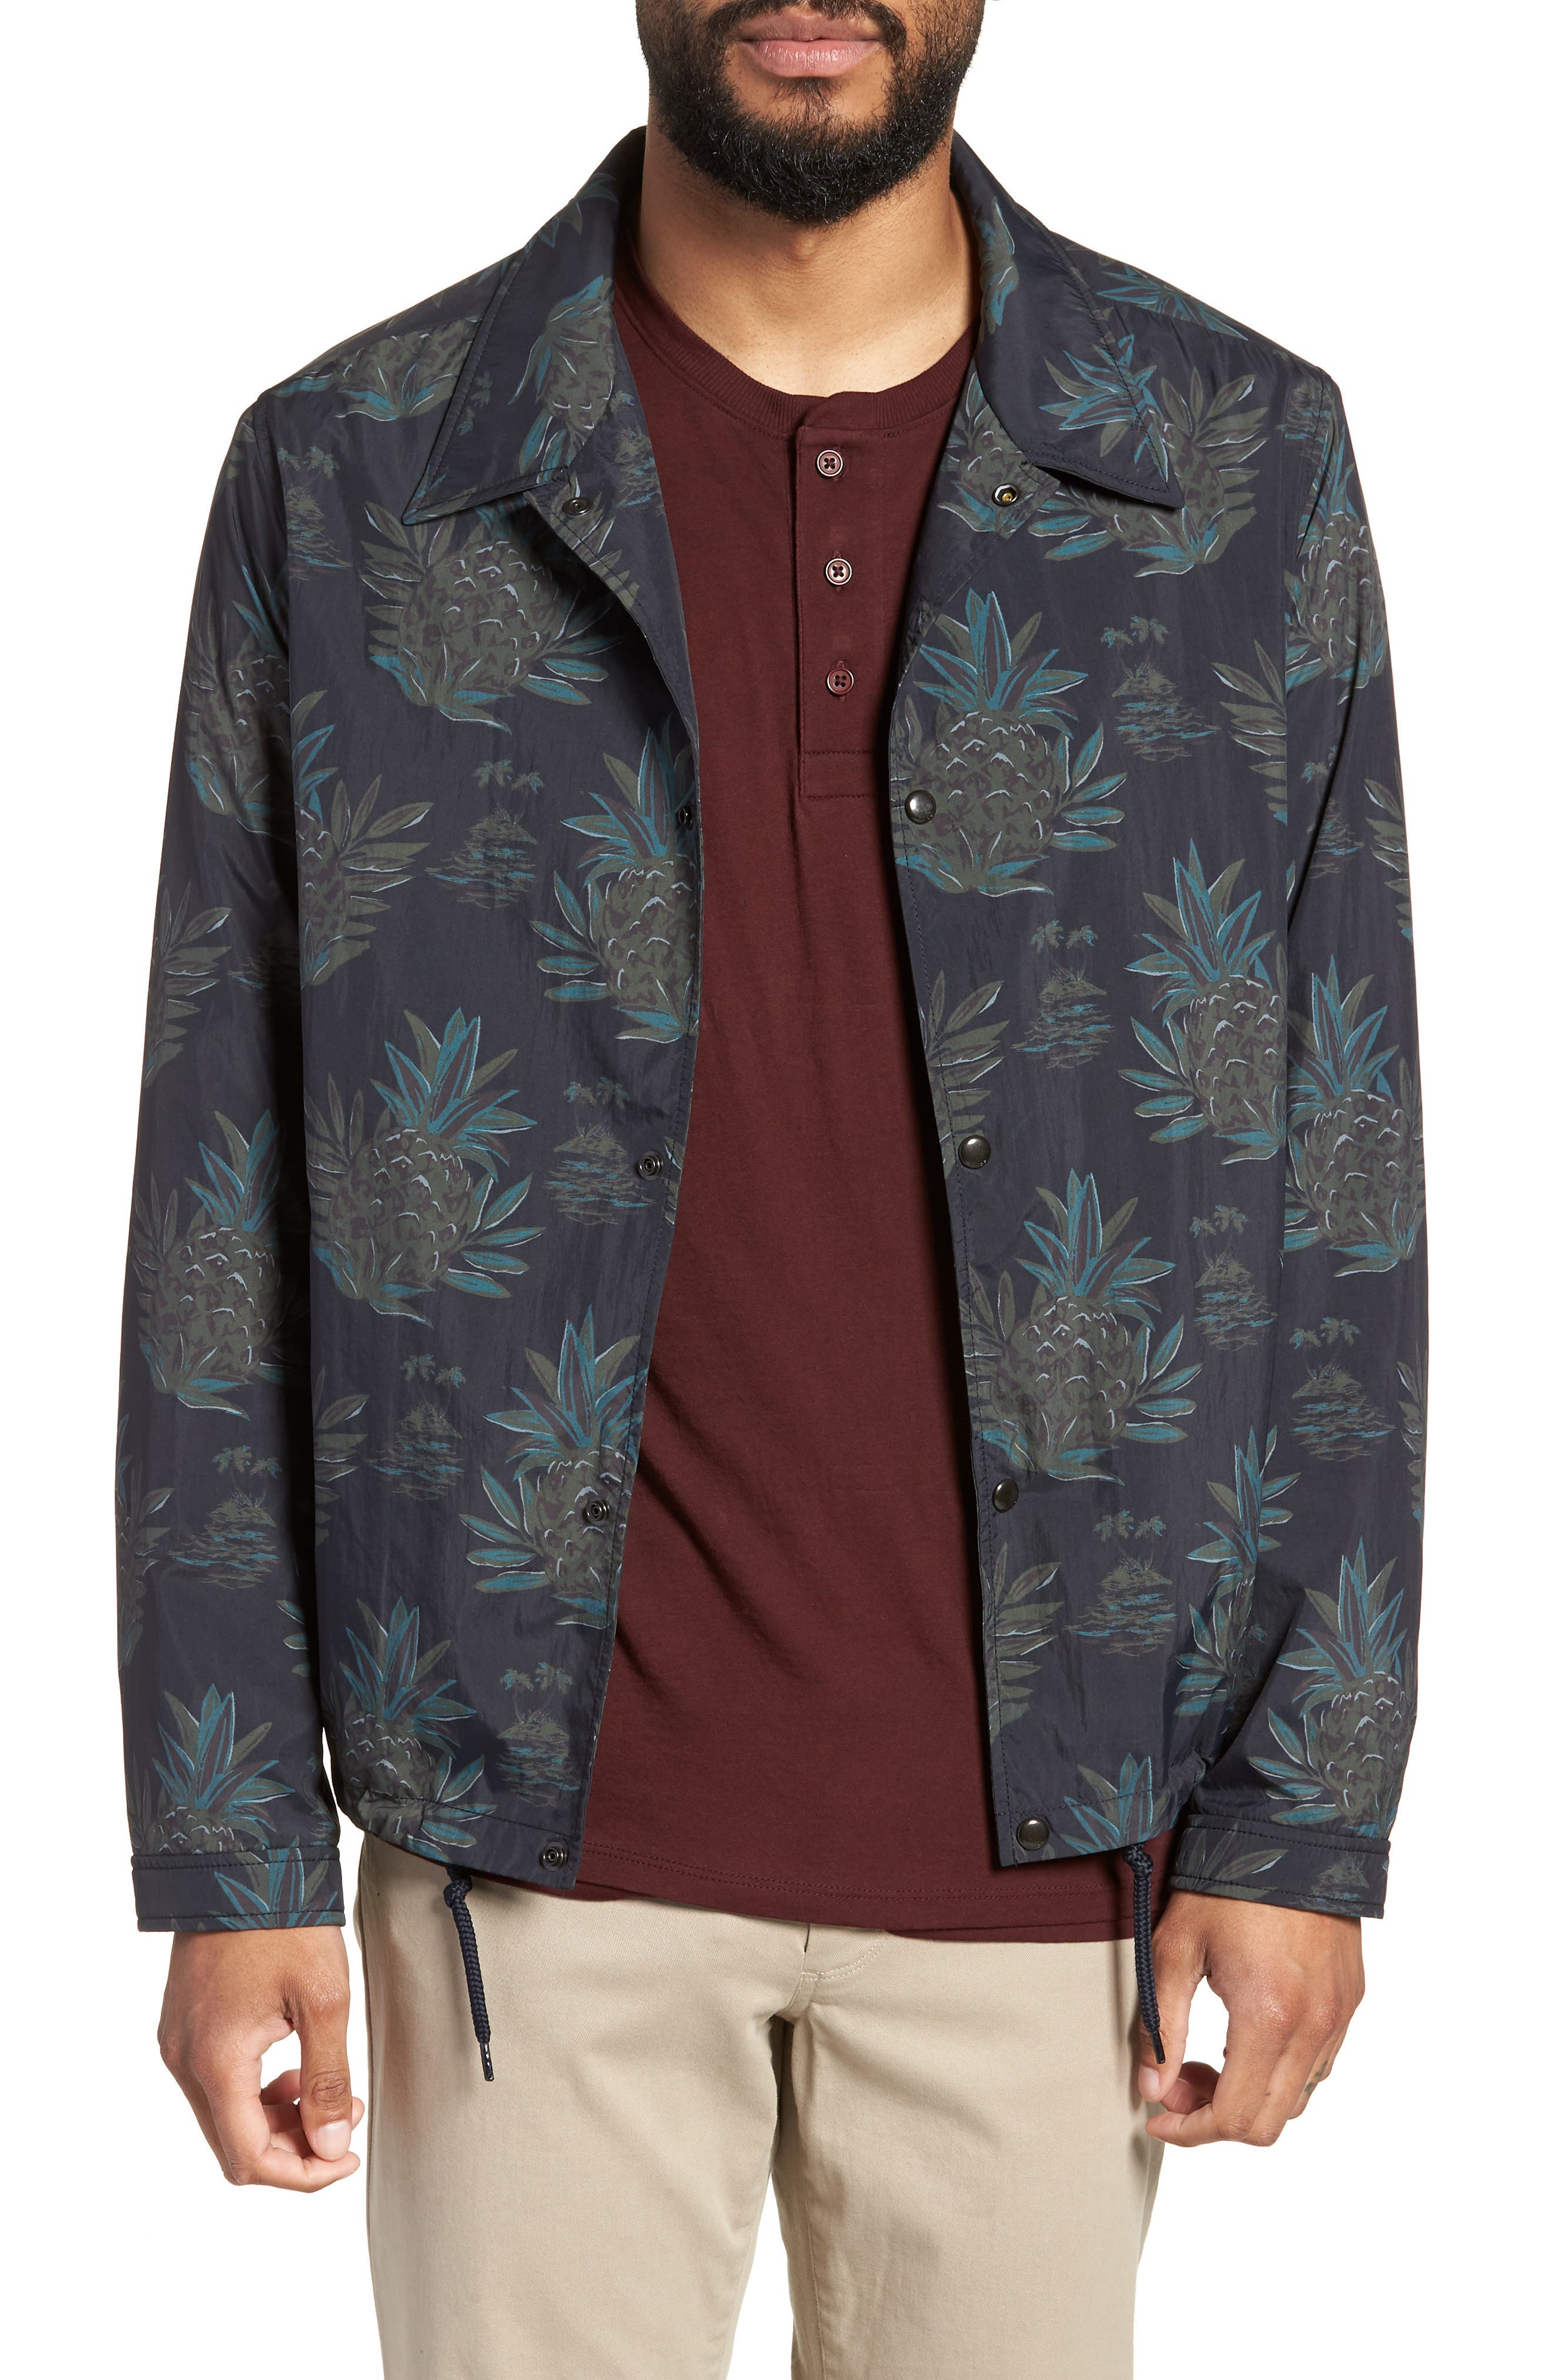 Tropical Regular Fit Coach's Jacket,                             Main thumbnail 1, color,                             New Coastal